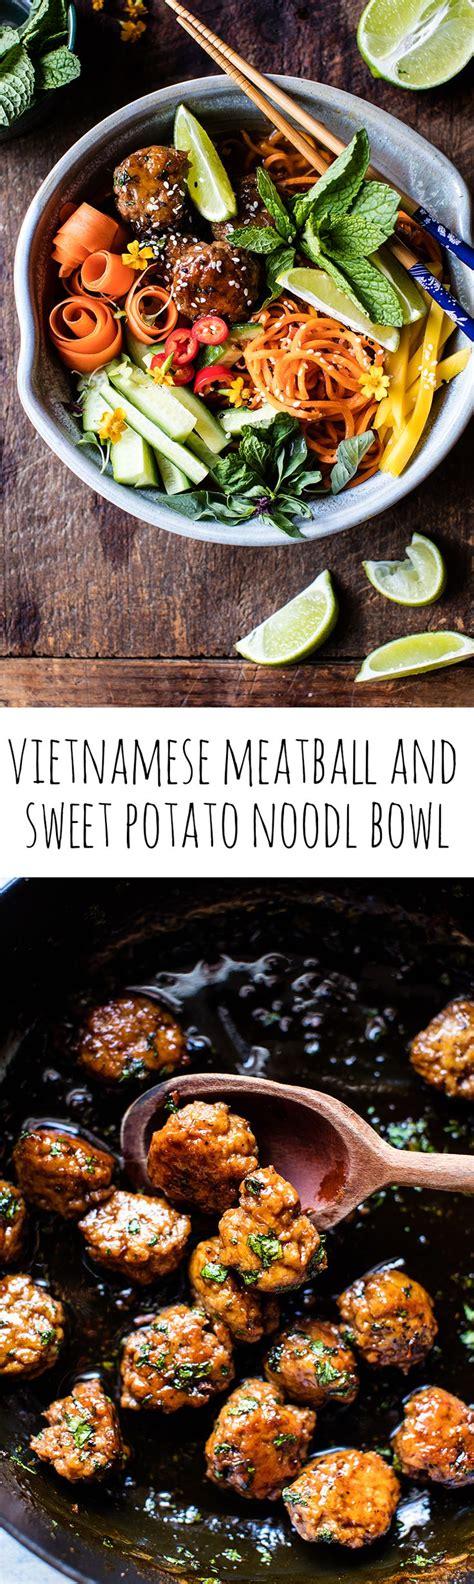 Https Www Halfbakedharvest Detox Coconut Lemongrass Chicken Ramen by Best 25 Noodle Bowls Ideas On Thai Coconut